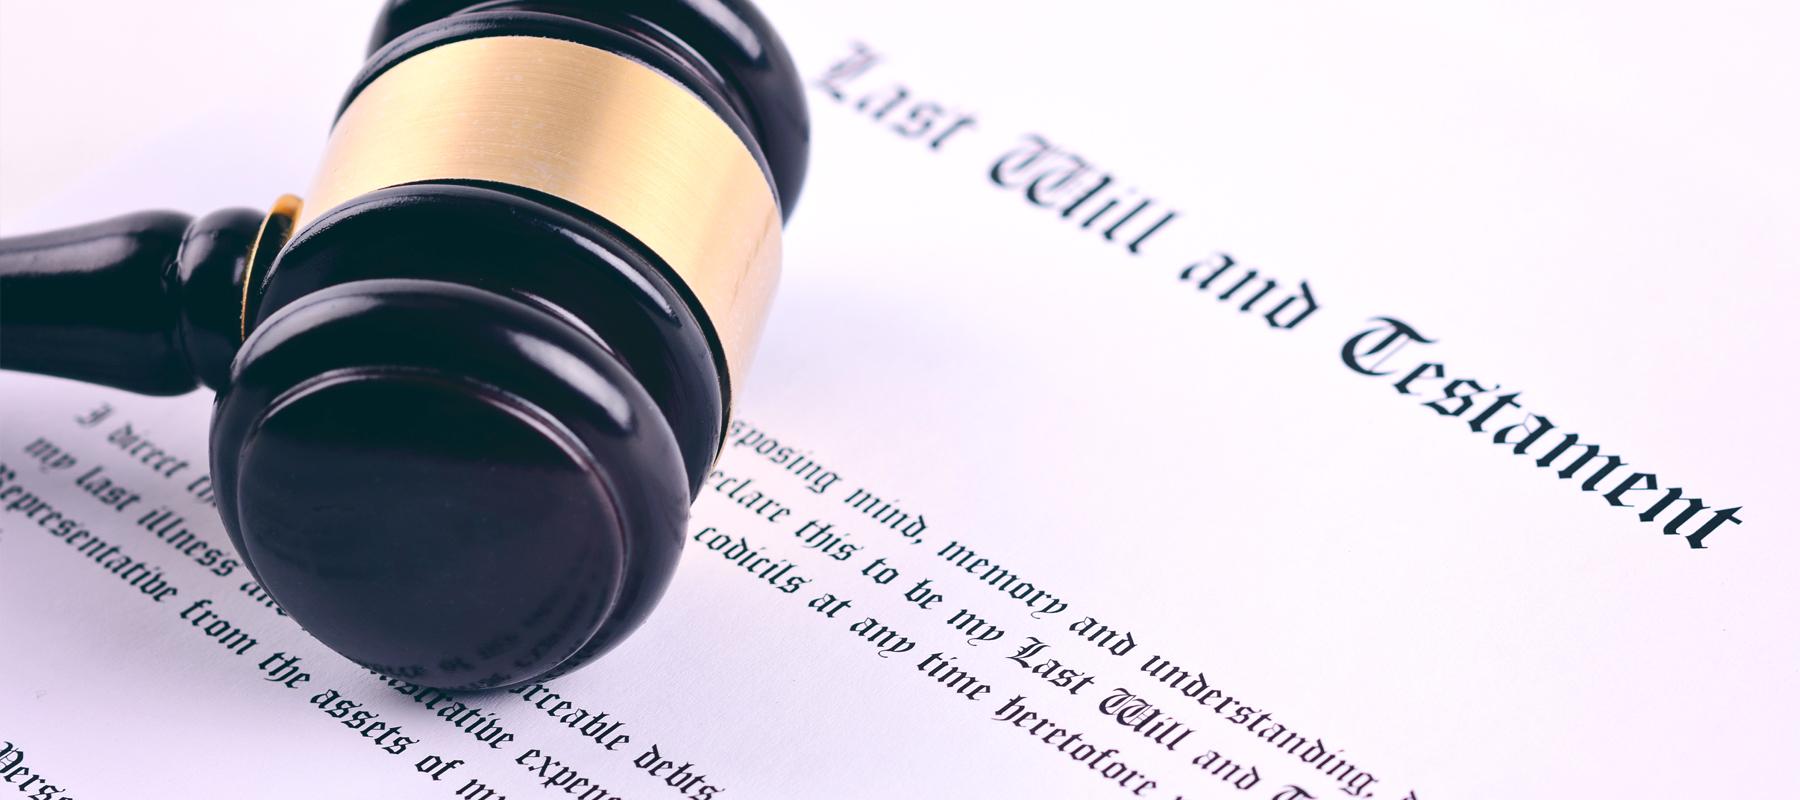 Gavel on legal documents